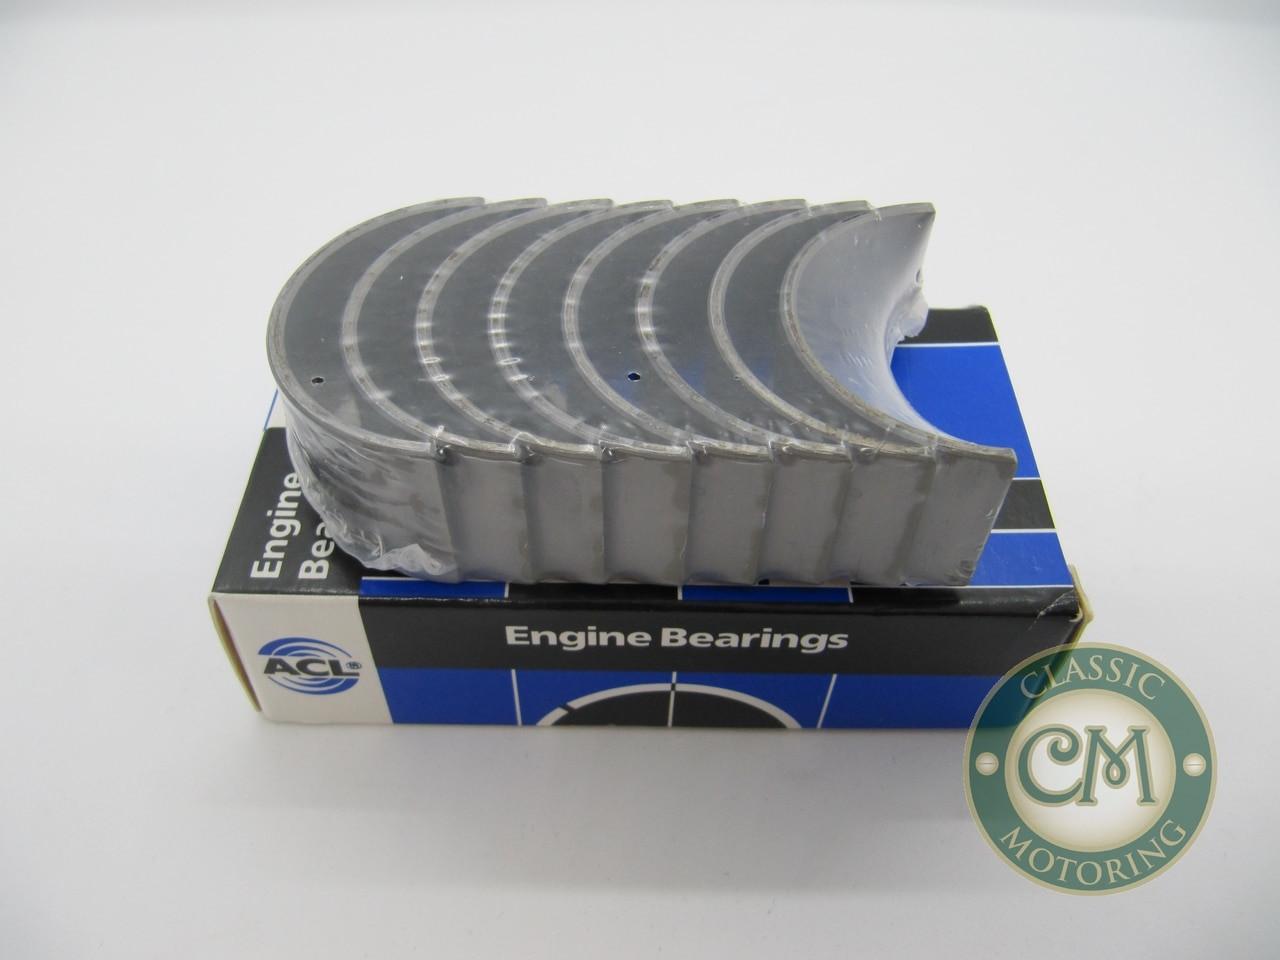 4B2201-040 Big End Bearings